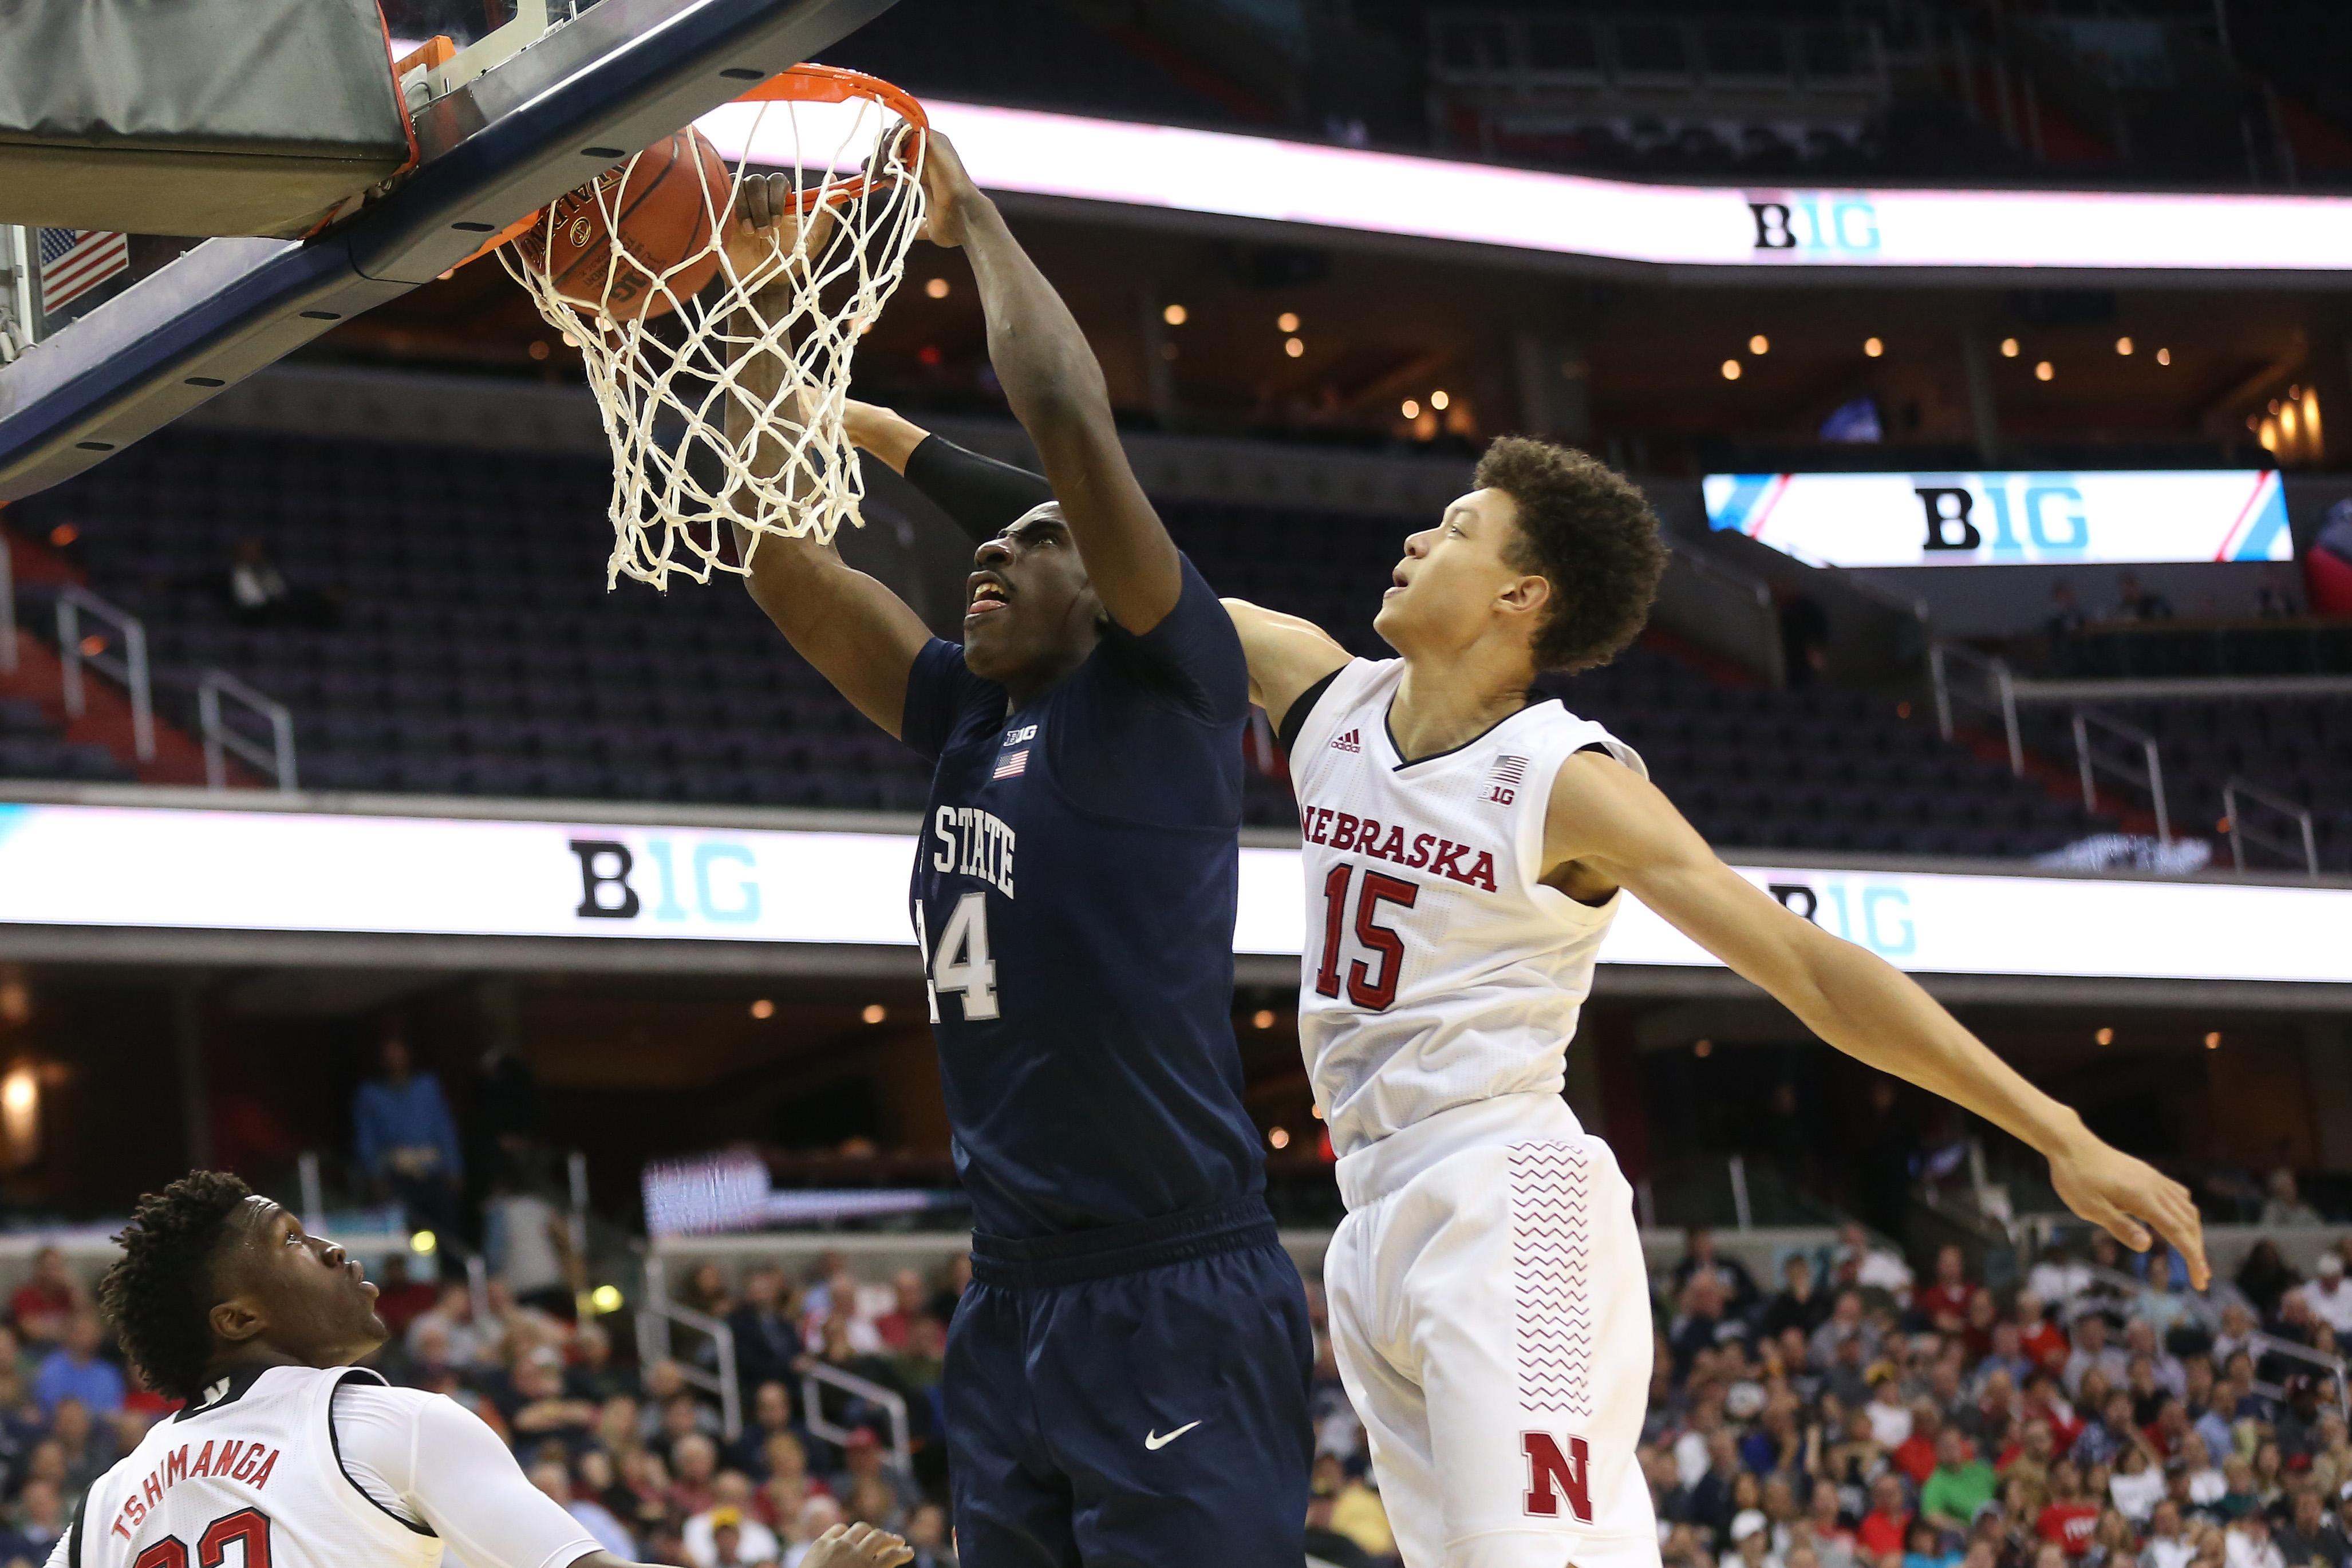 9926267-ncaa-basketball-big-ten-conference-tournament-penn-state-vs-nebraska